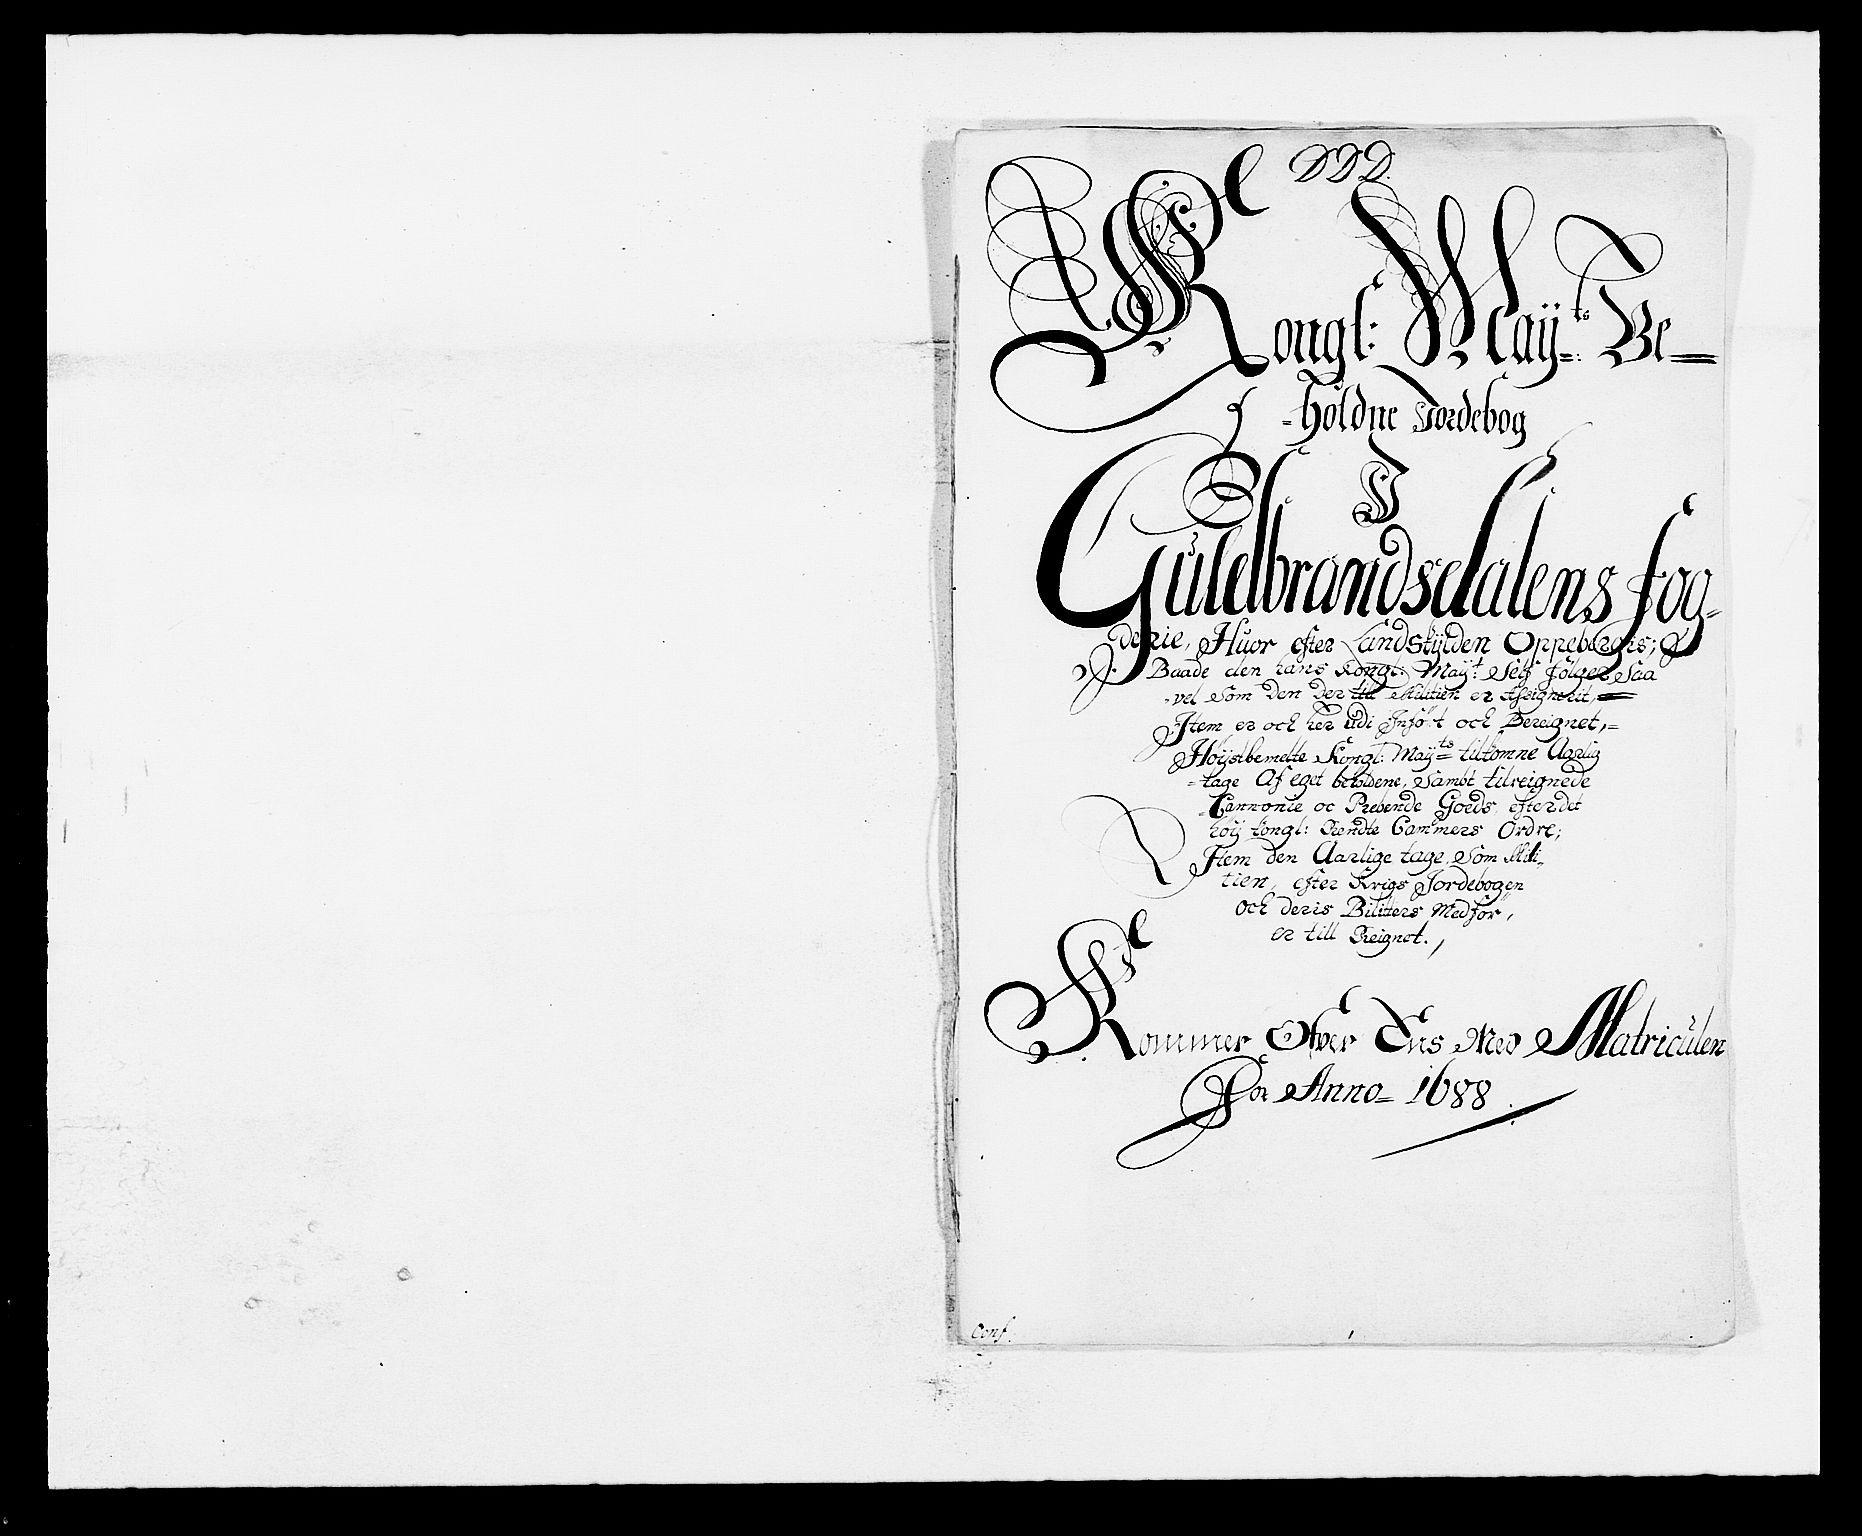 RA, Rentekammeret inntil 1814, Reviderte regnskaper, Fogderegnskap, R17/L1163: Fogderegnskap Gudbrandsdal, 1682-1689, s. 66